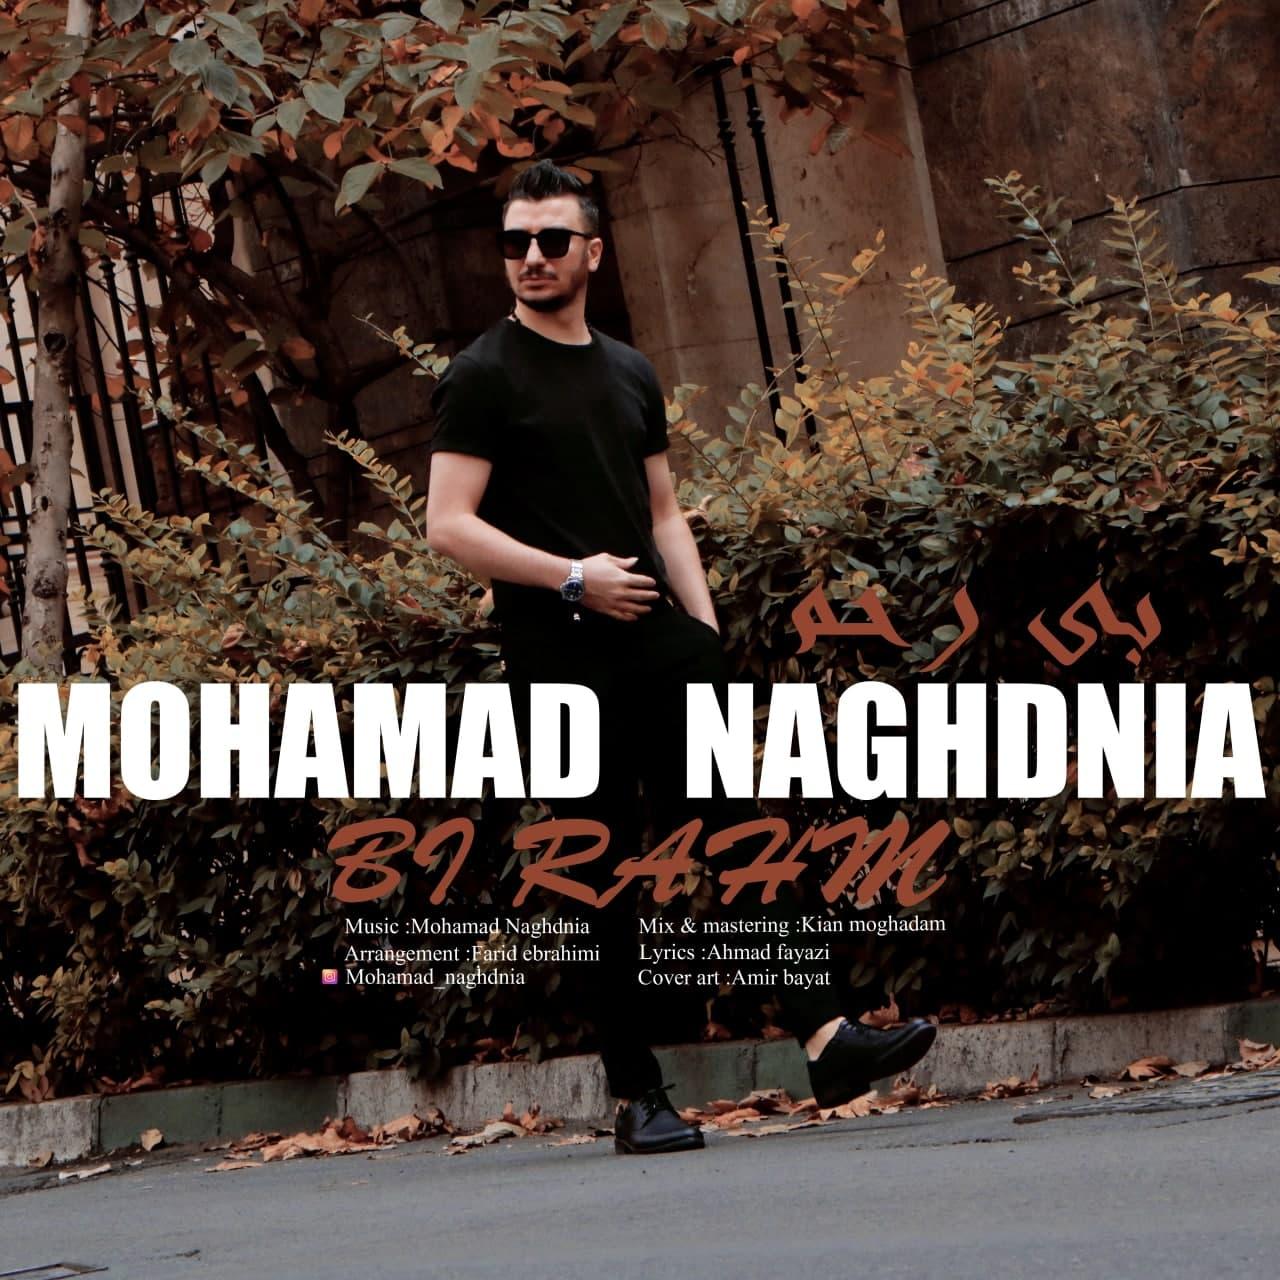 Mohamad Naghdnia – Bi Rahm